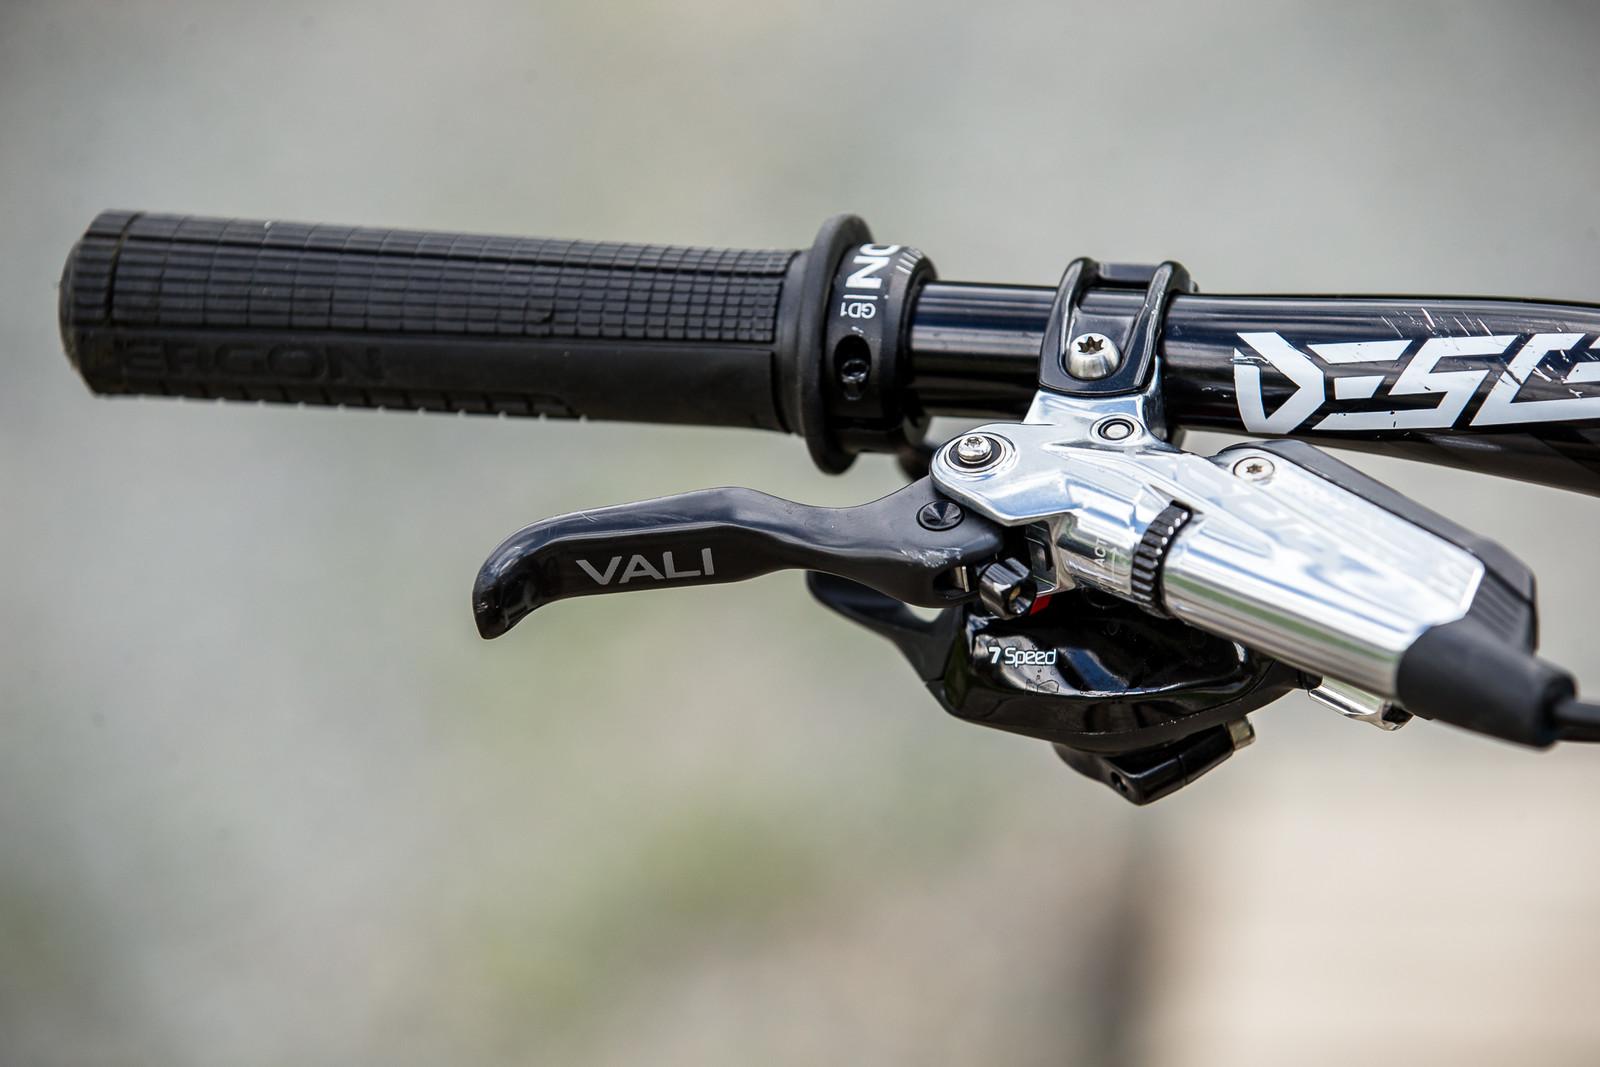 Ergon GD1 Grips, SRAM CODE Brakes - WINNING BIKE - Vali Höll's YT TUES - Mountain Biking Pictures - Vital MTB